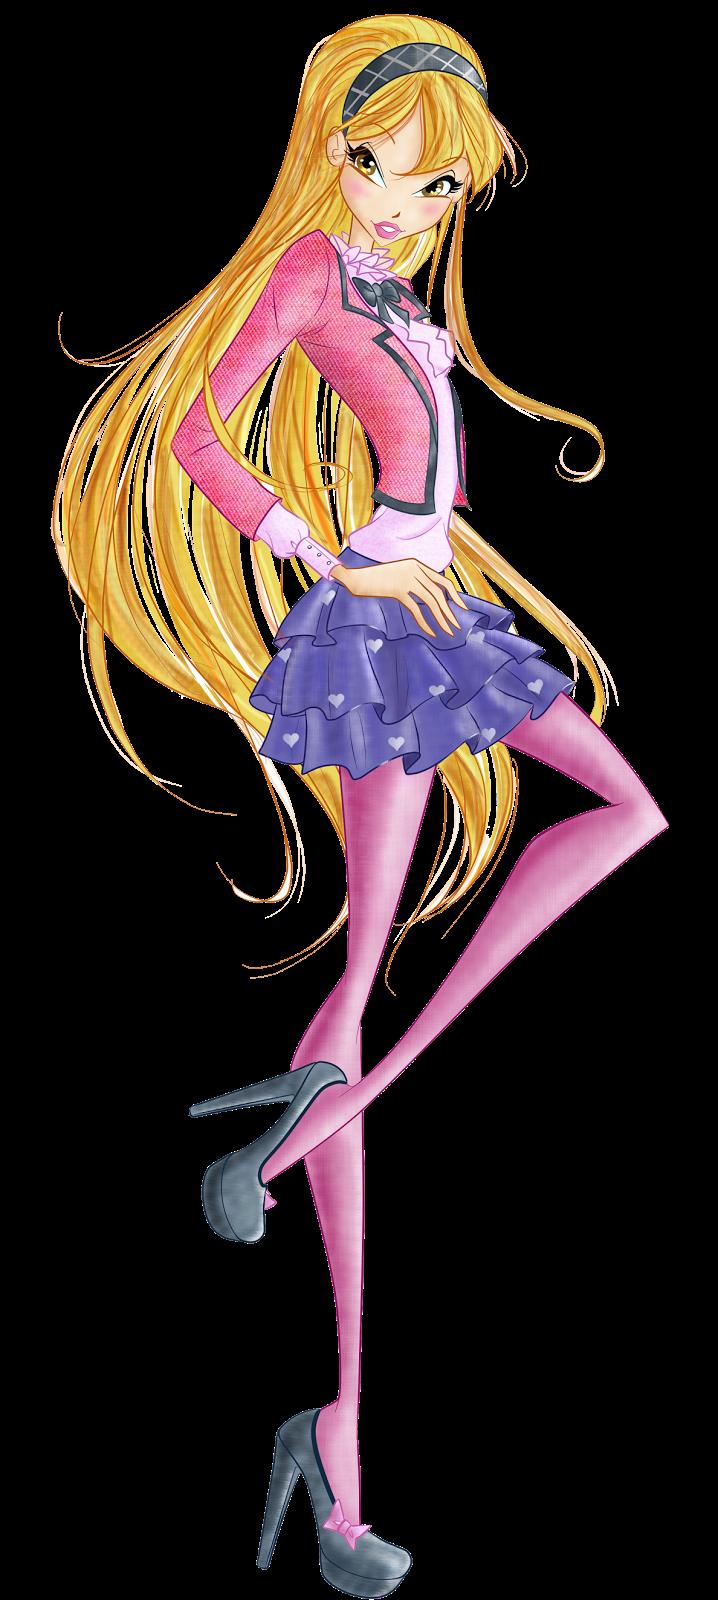 Winx Club Fairies: Stella School Look